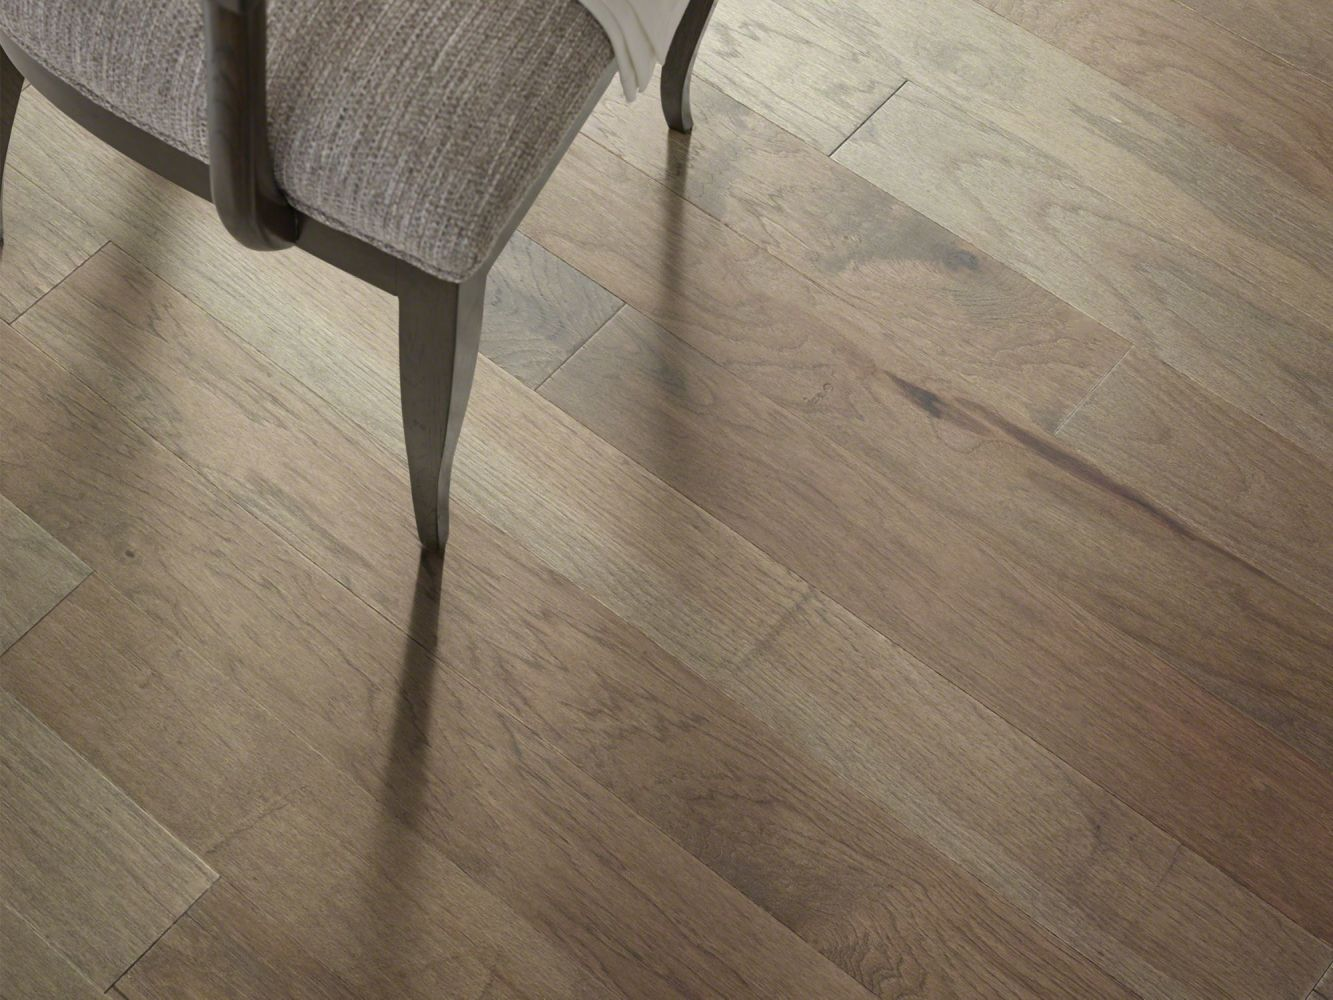 Shaw Floors SFA Raven Rock Smooth Chestnut 07035_219SA